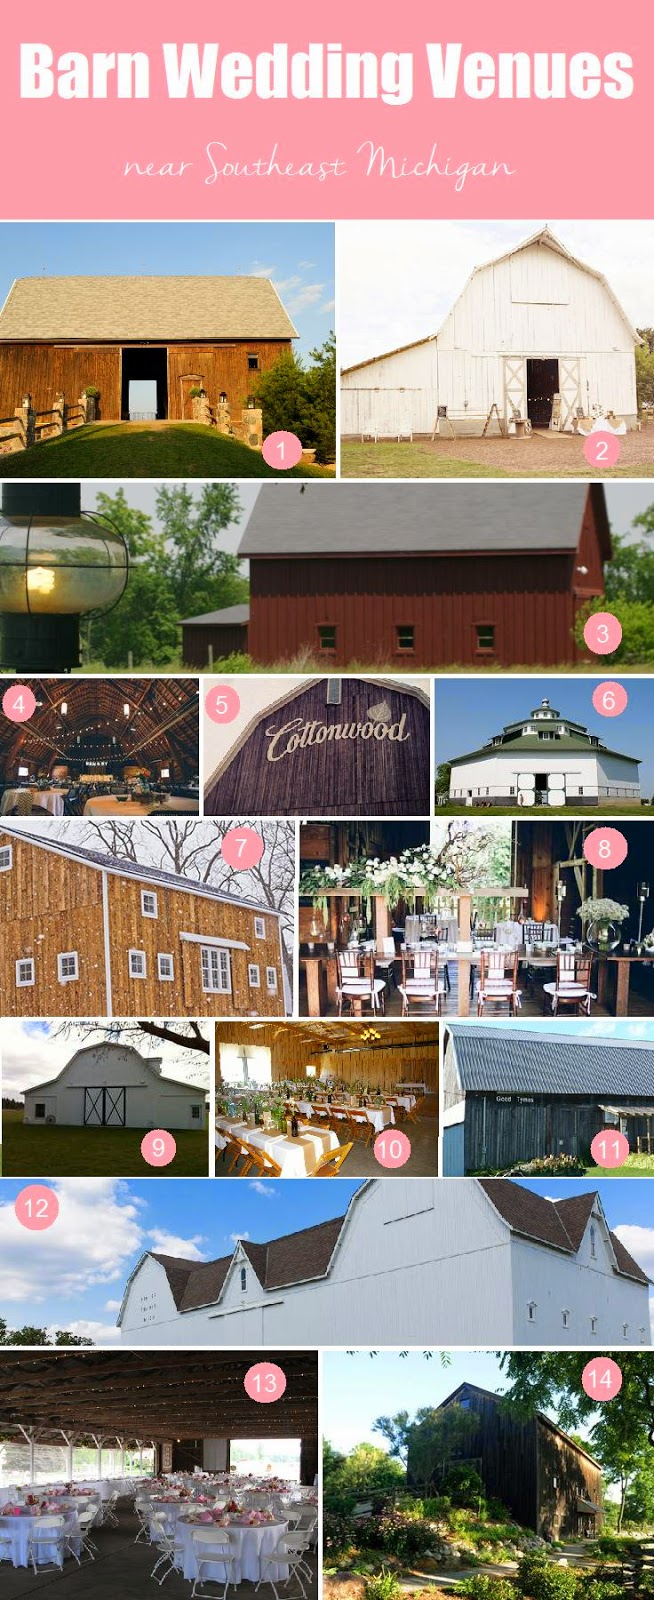 Michigan+Barn+Wedding+Venues.jpg